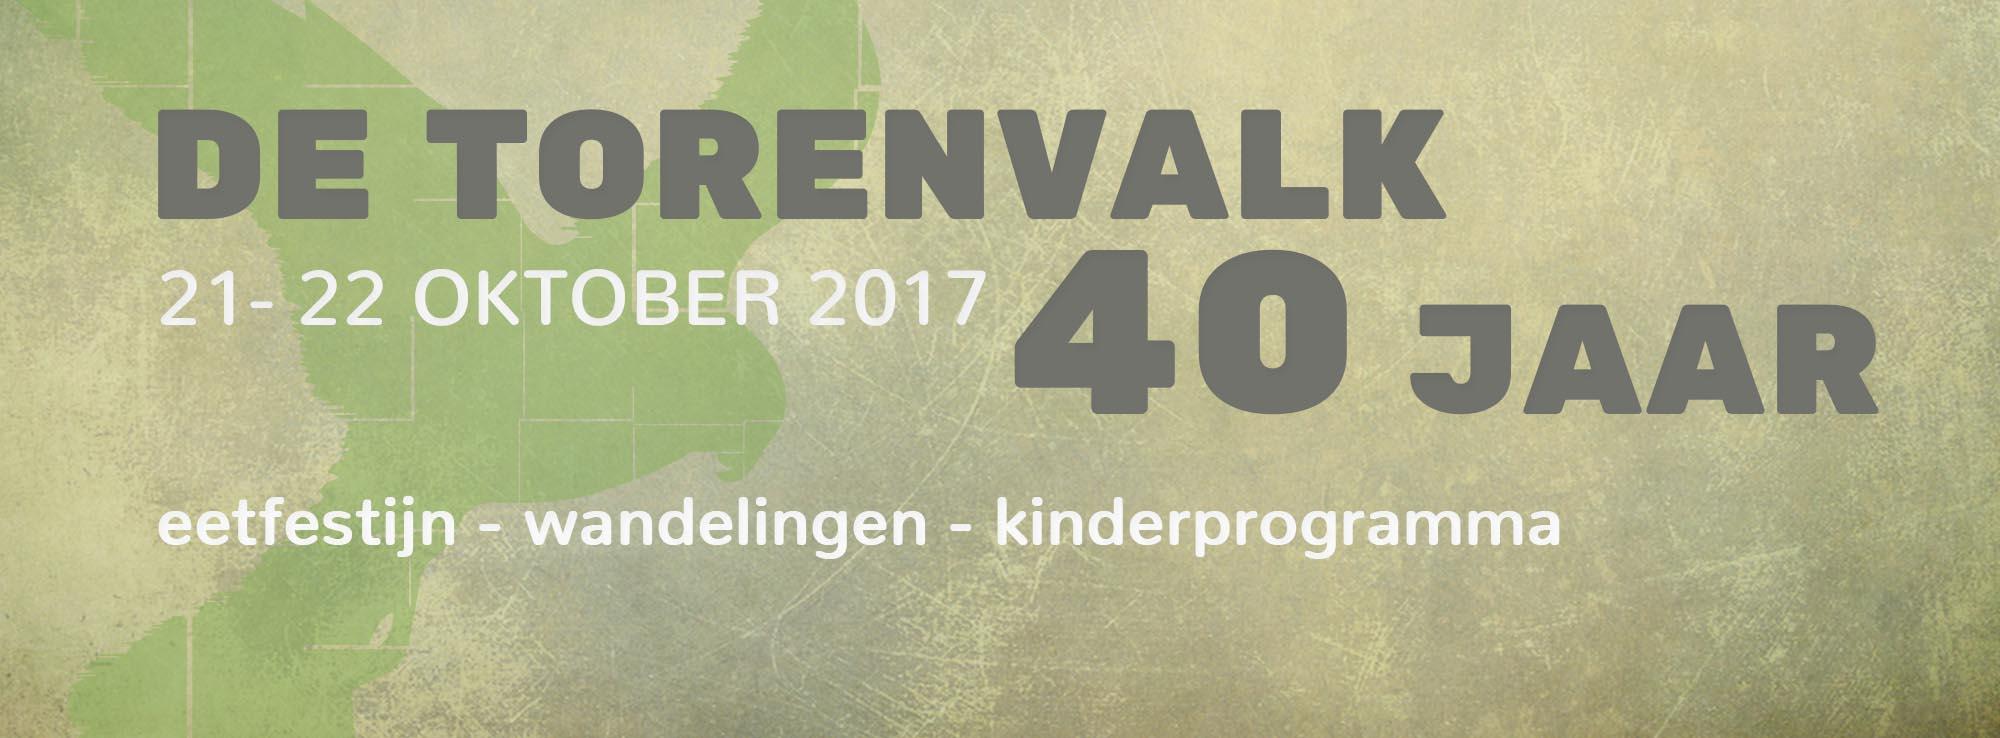 Fototerugblik eetfestijn 40 jaar Torenvalk